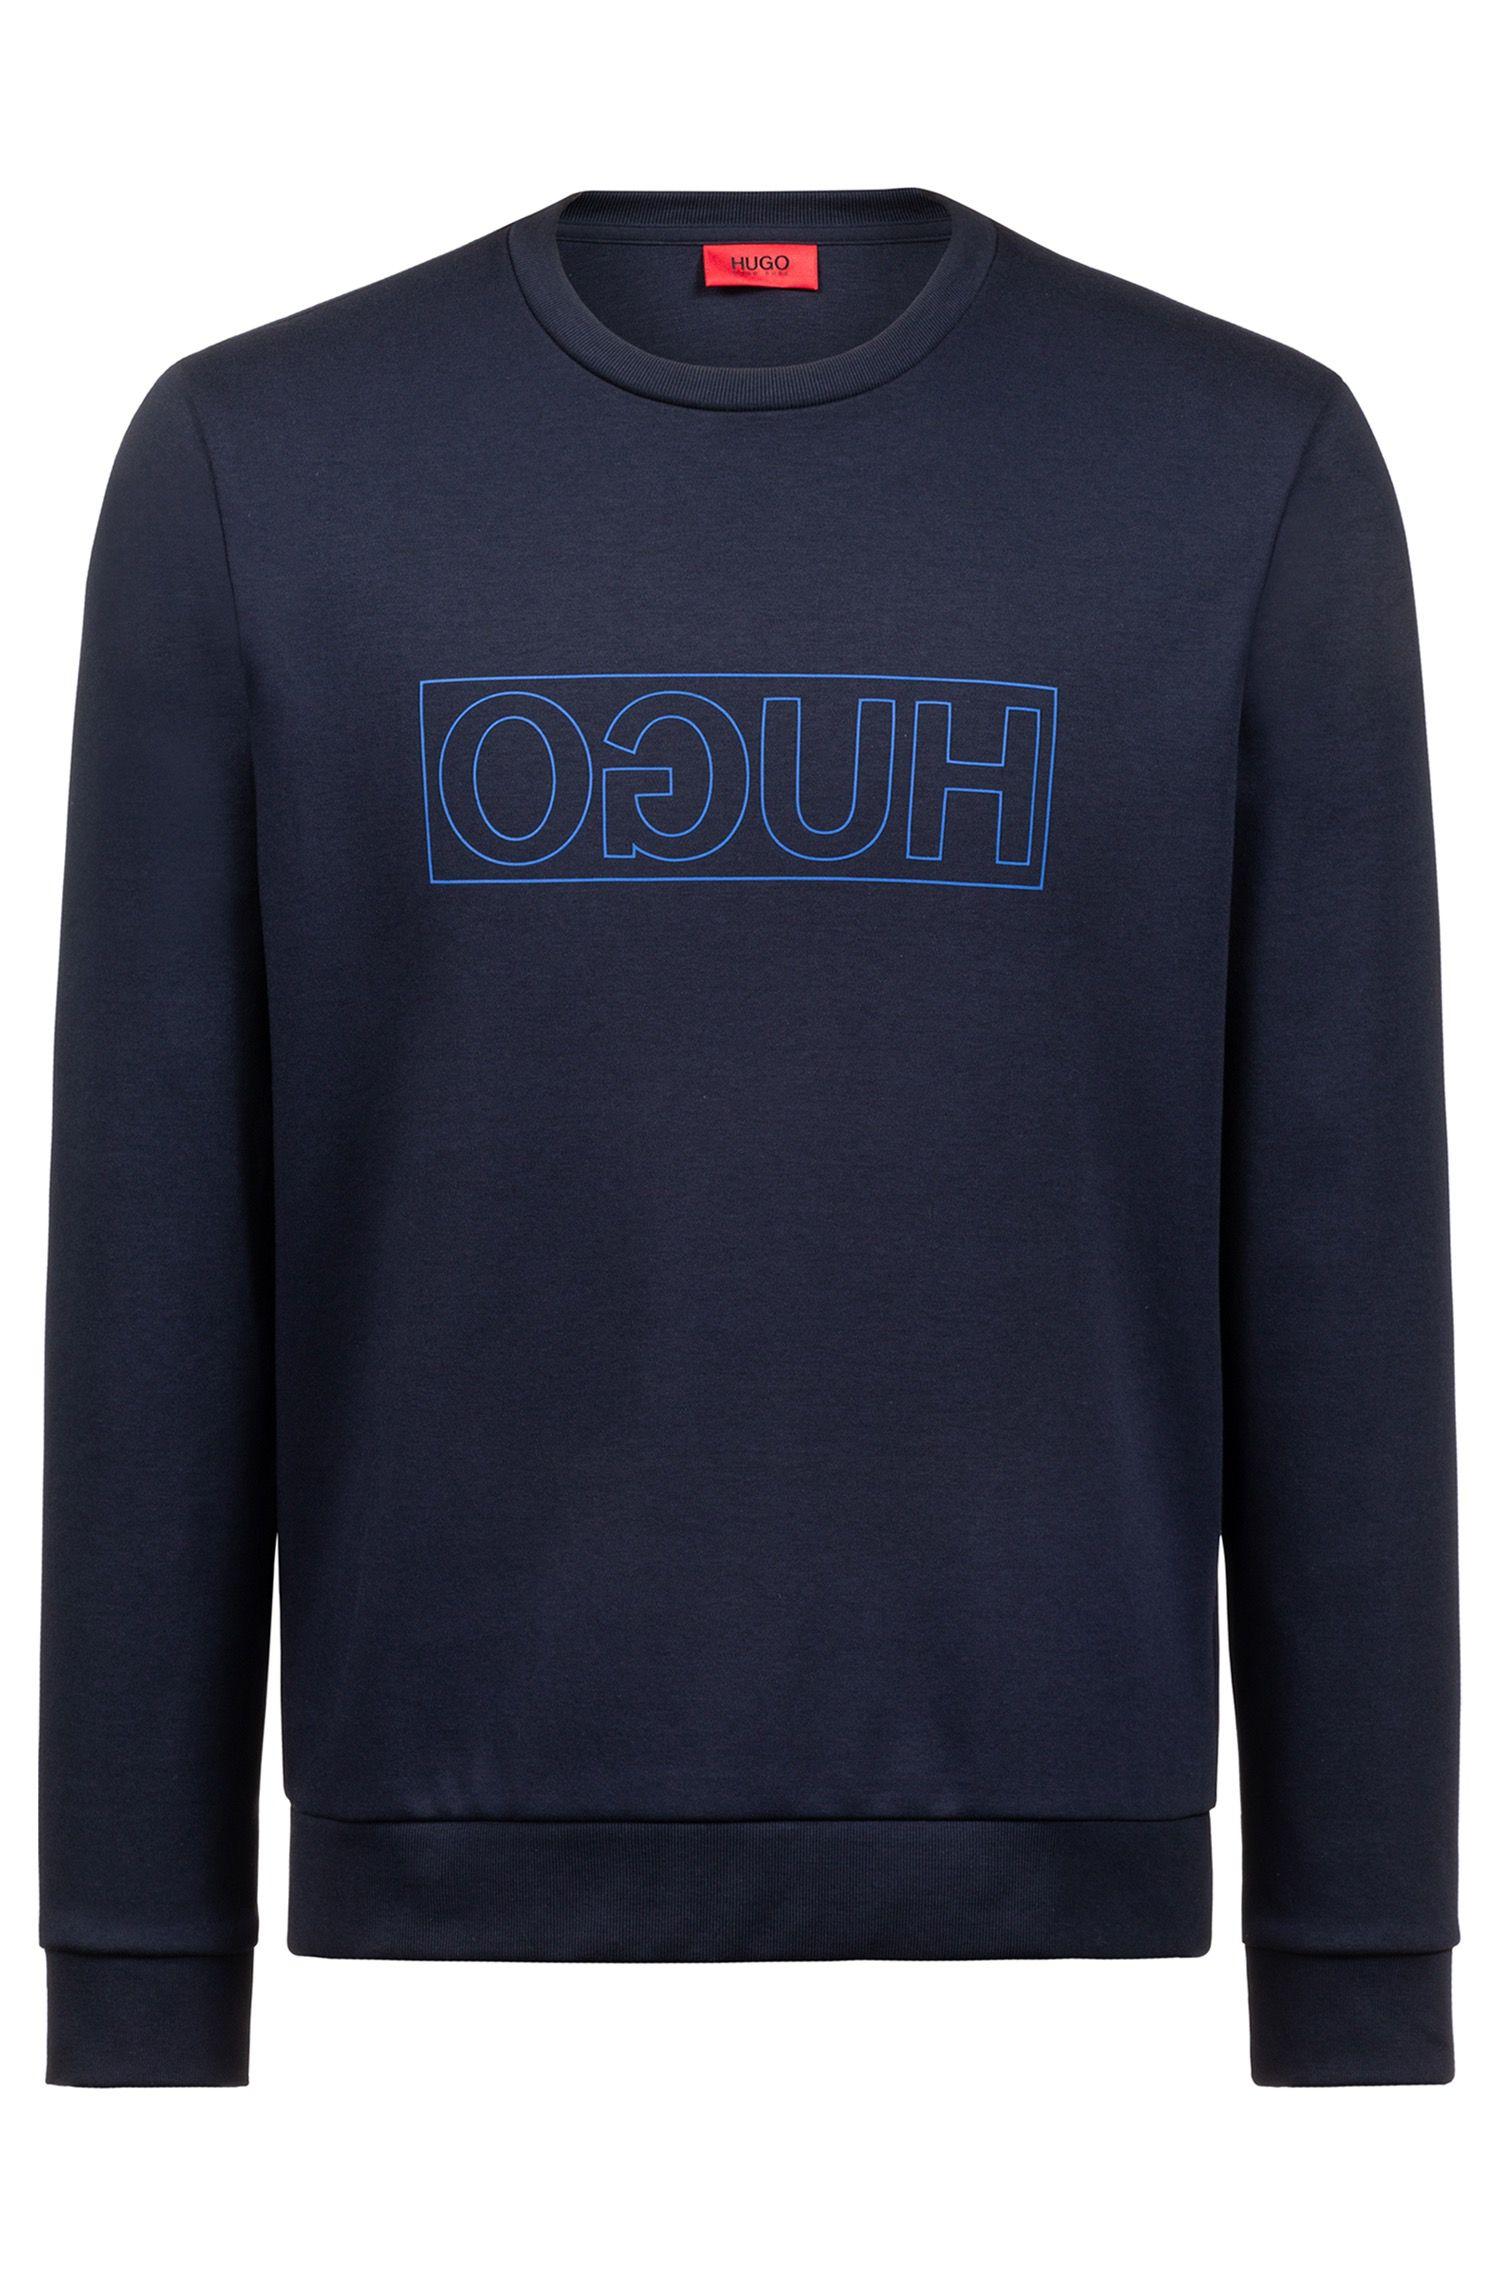 Sudadera con logo invertido en algodón interlock, Azul oscuro